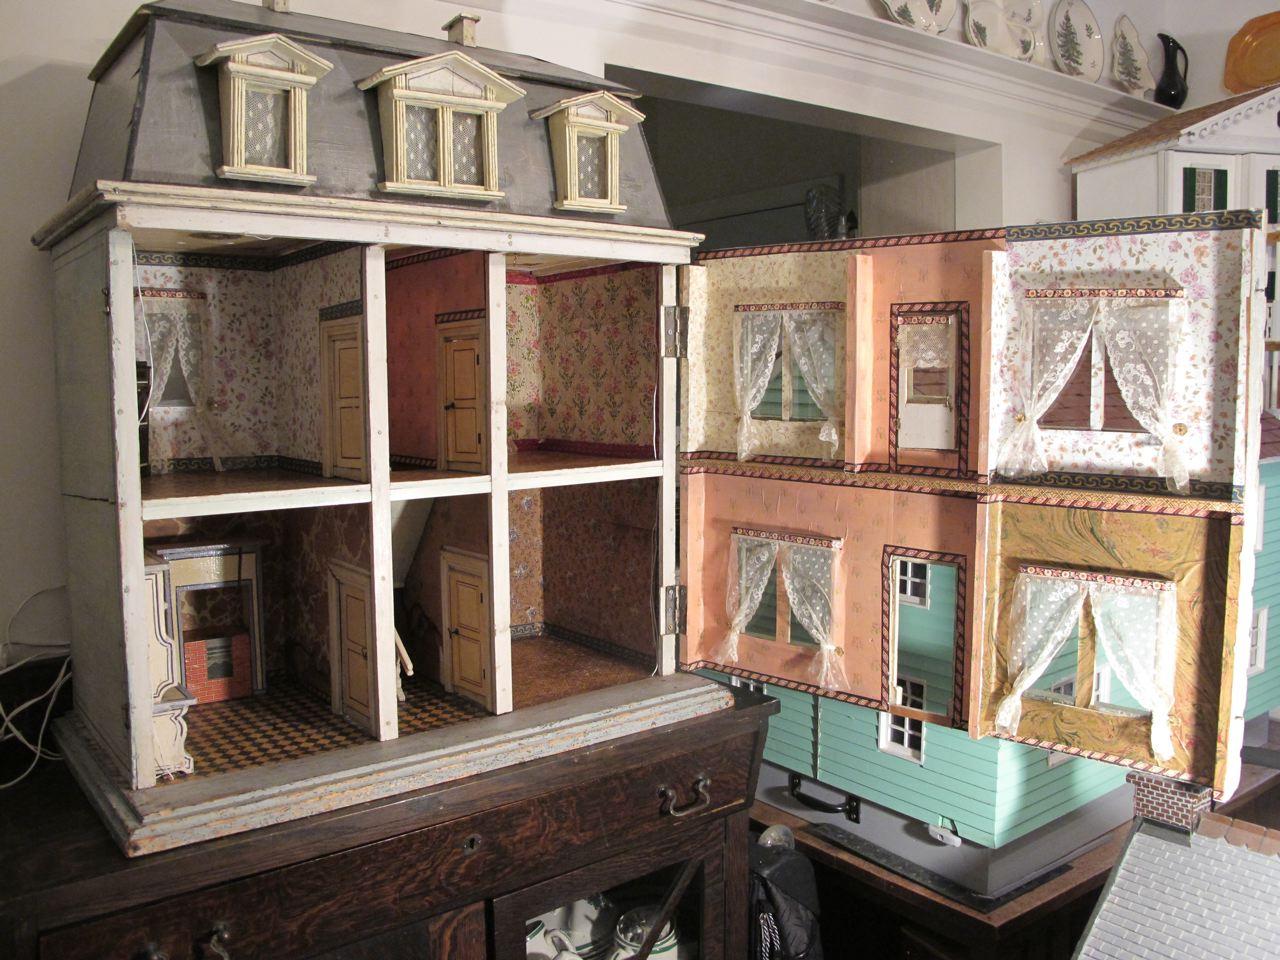 Susan S Mini Homes Christian Hacker Antique Dollhouse